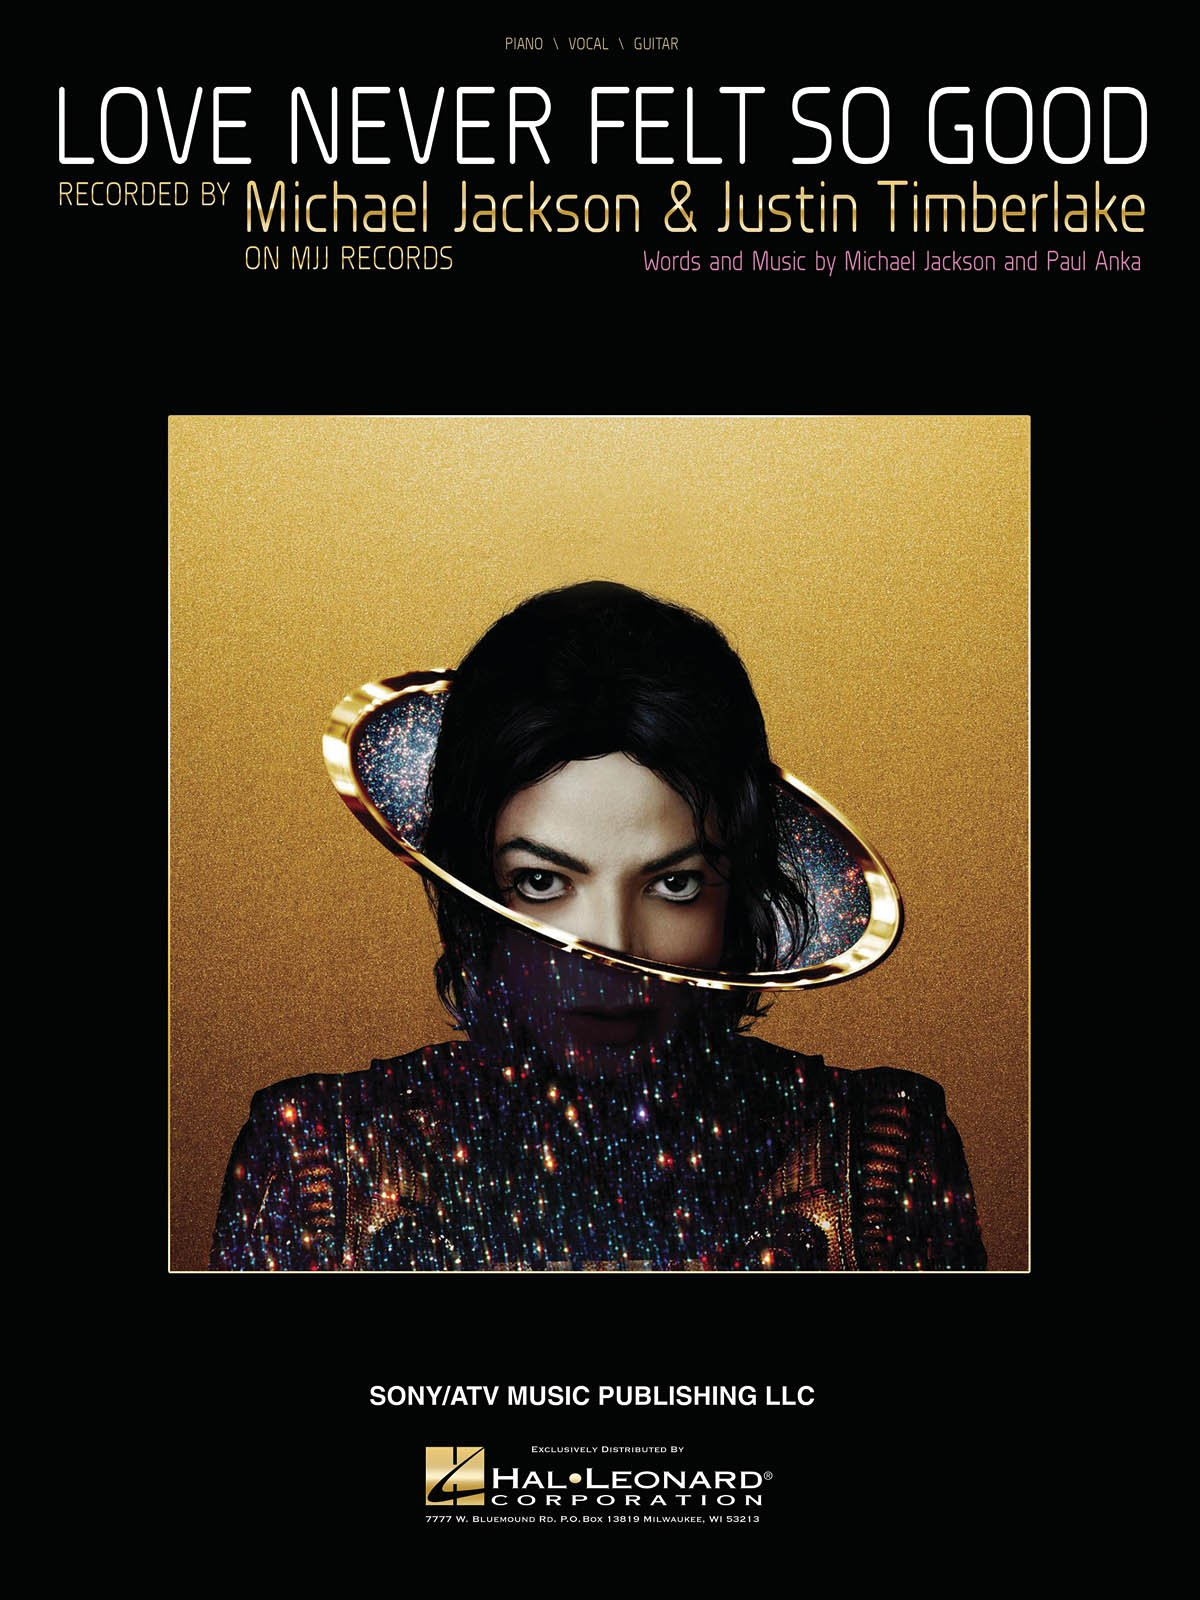 Love Never Felt So Good Micahel Jackson Justin Timberlake Piano Vocal Guitar Micahel Jackson Justin Timberlake  Amazon Com Books